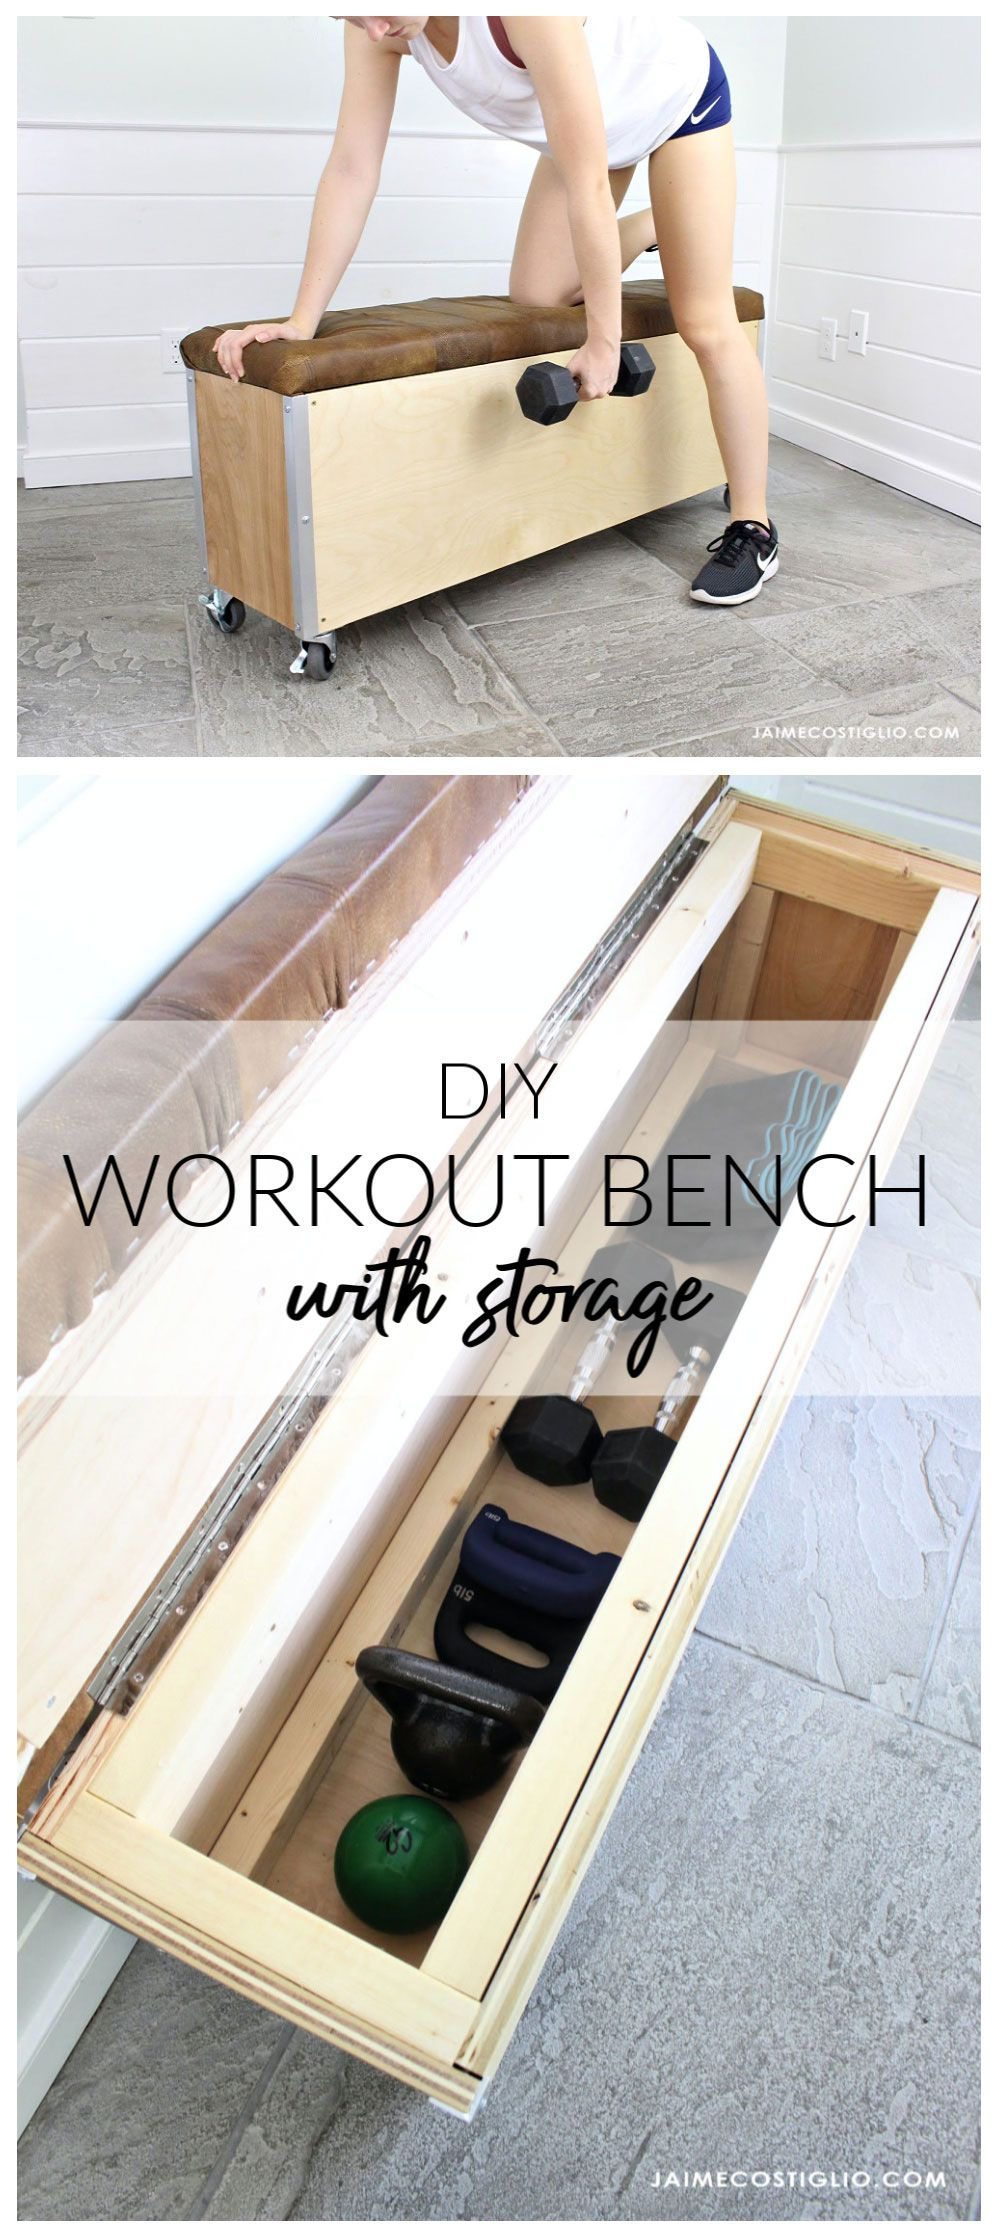 Photo of DIY Workout Bench with Storage – Jaime Costiglio